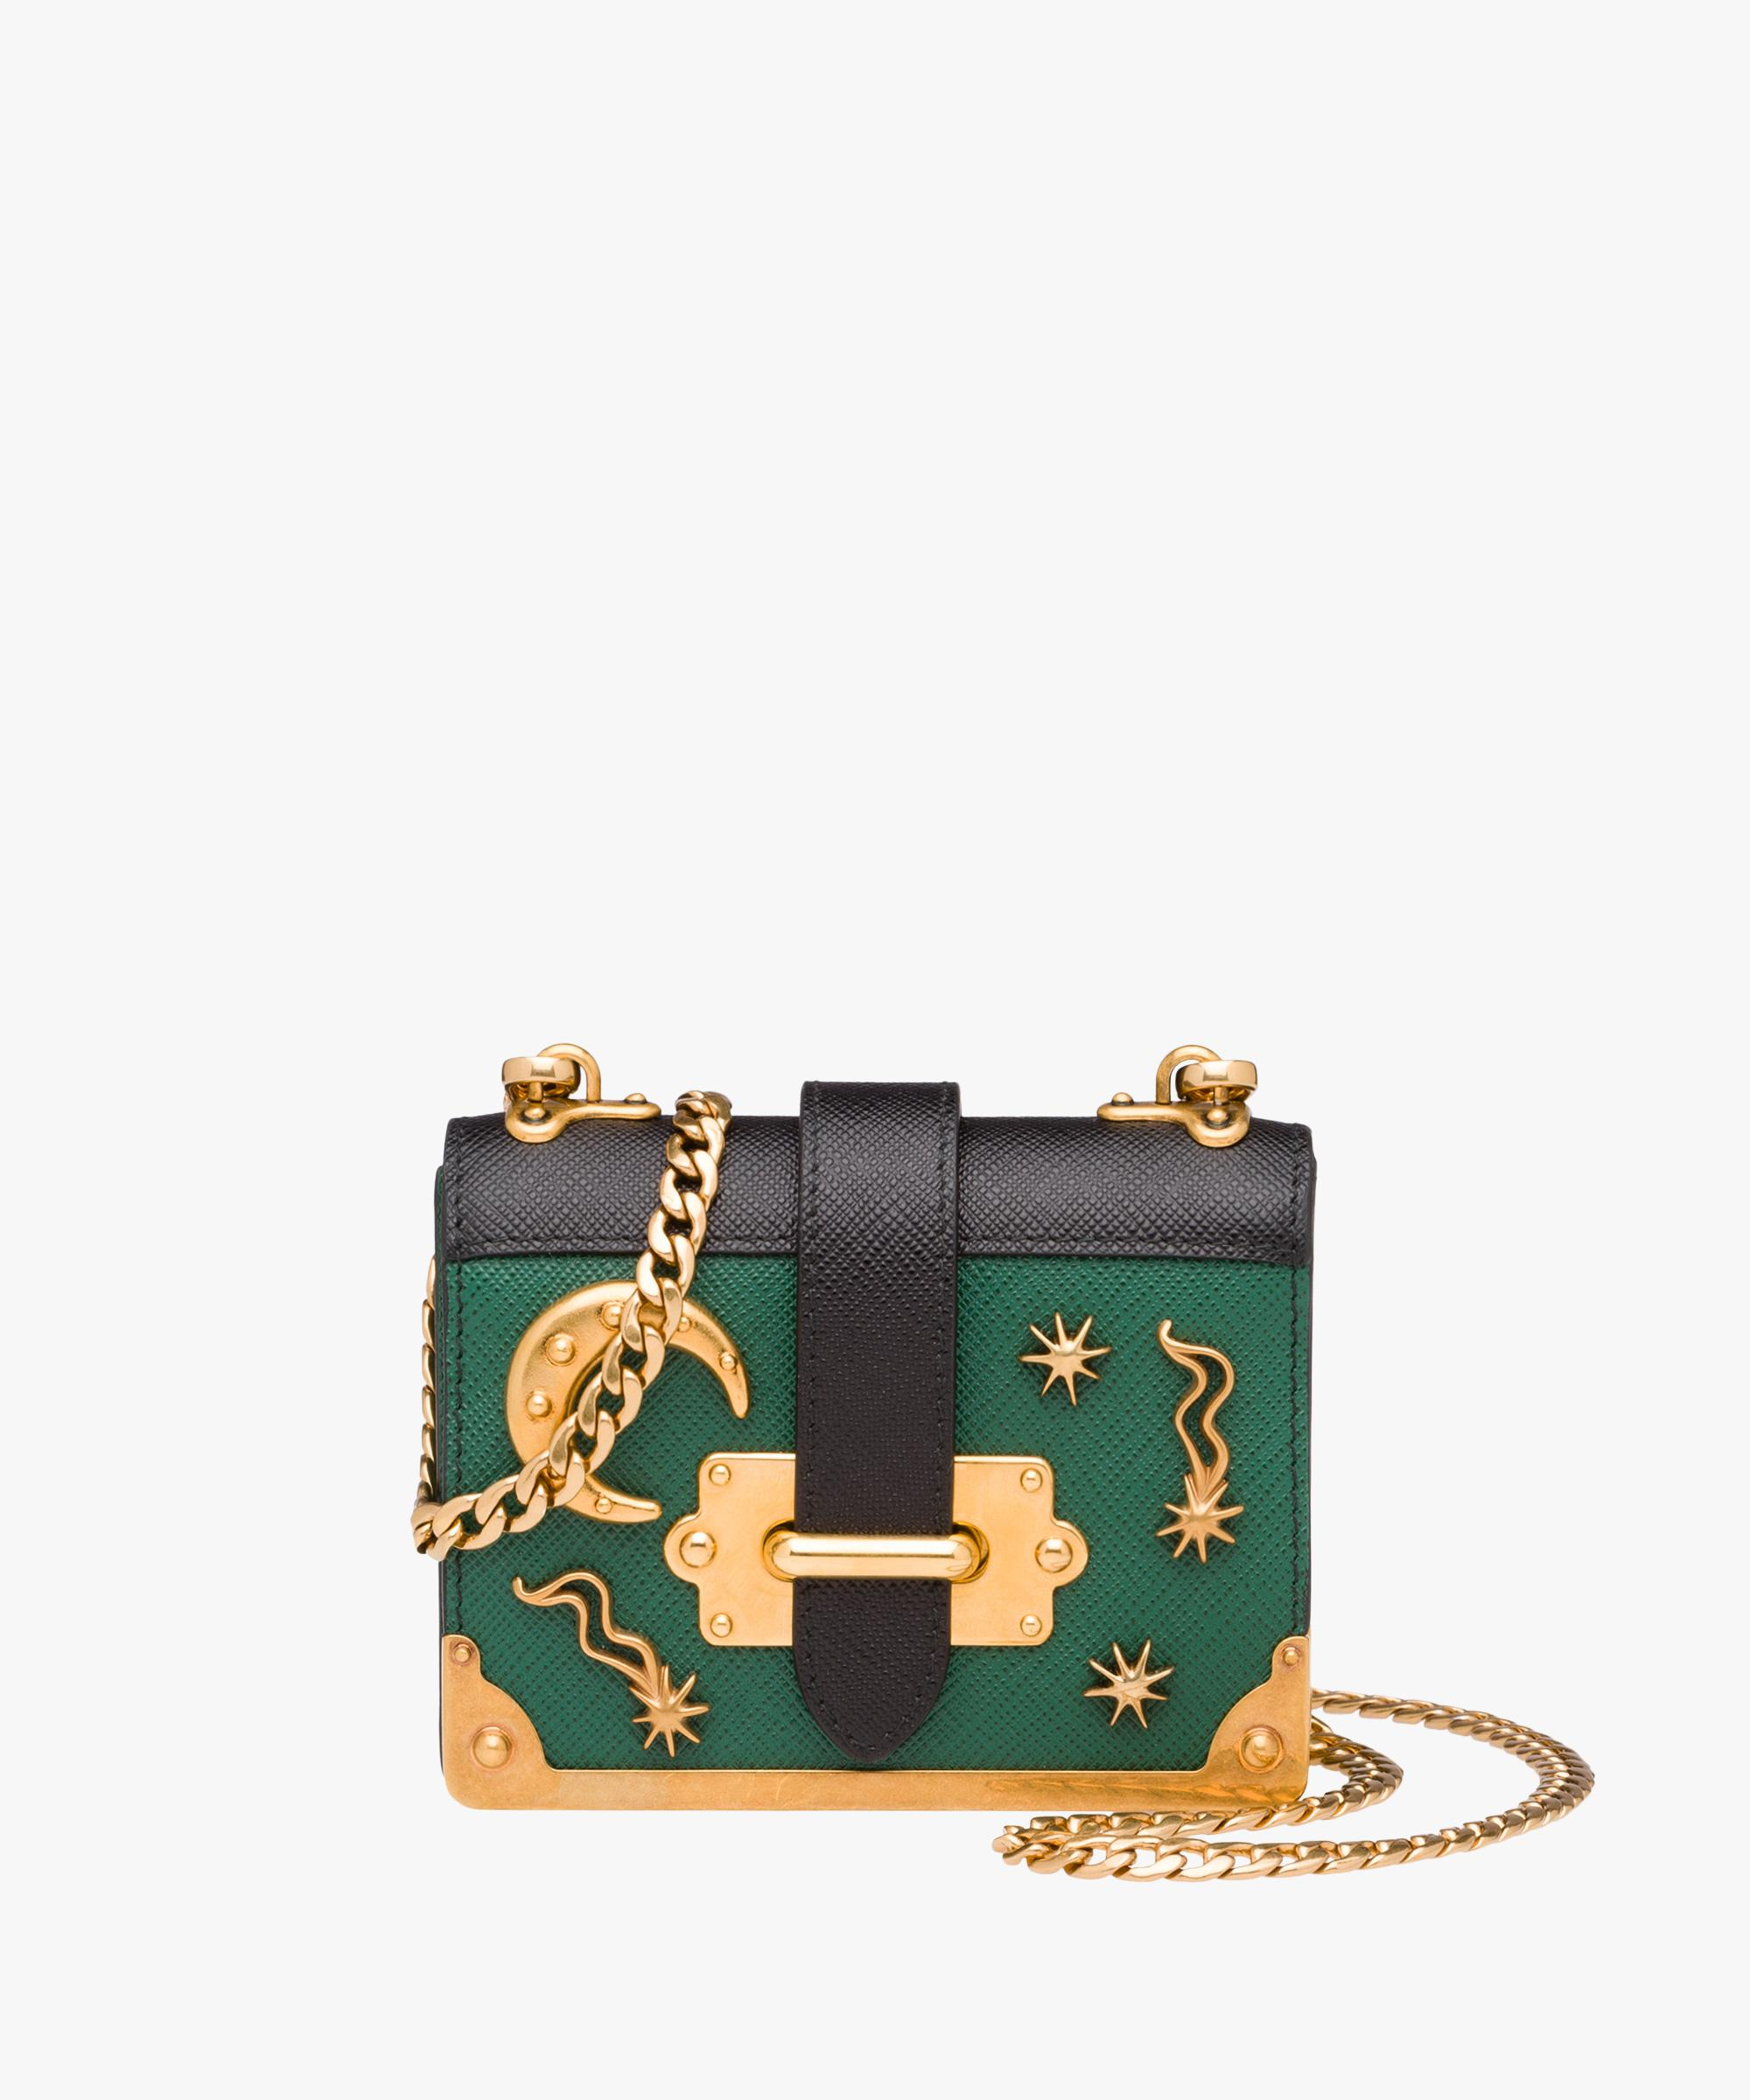 99de09da67daa Lyst - Prada Micro Cahier Saffiano Leather Bag in Green